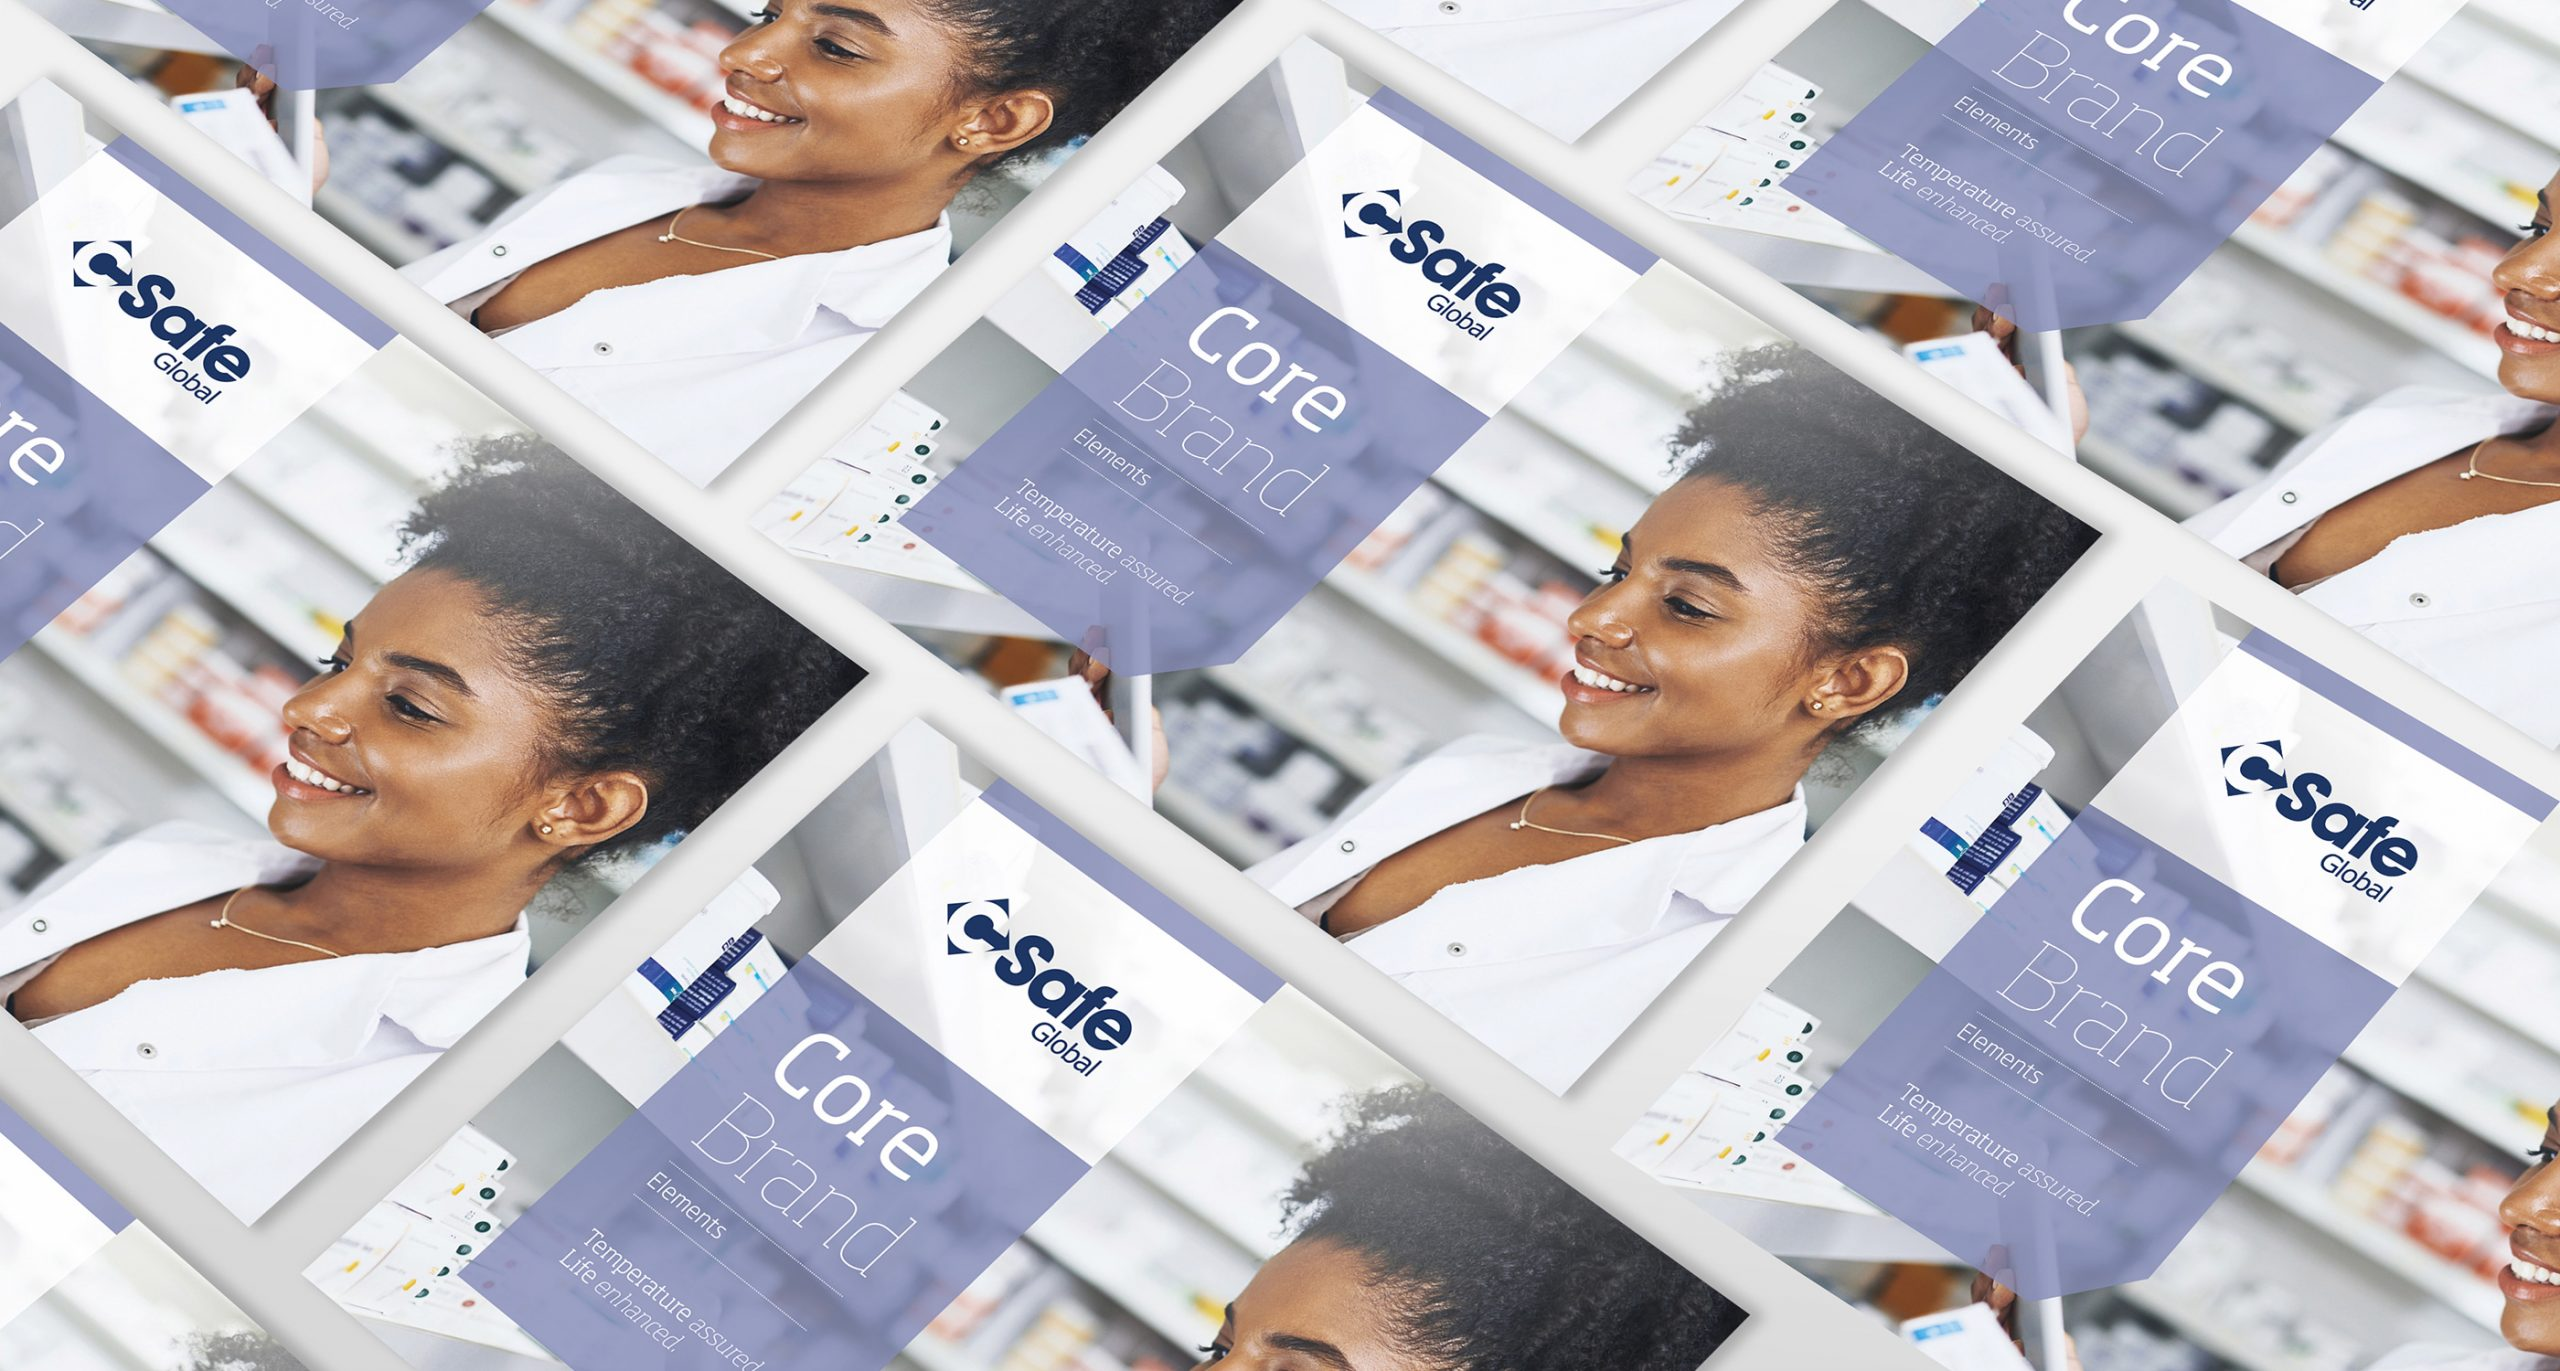 CSafe brand guides